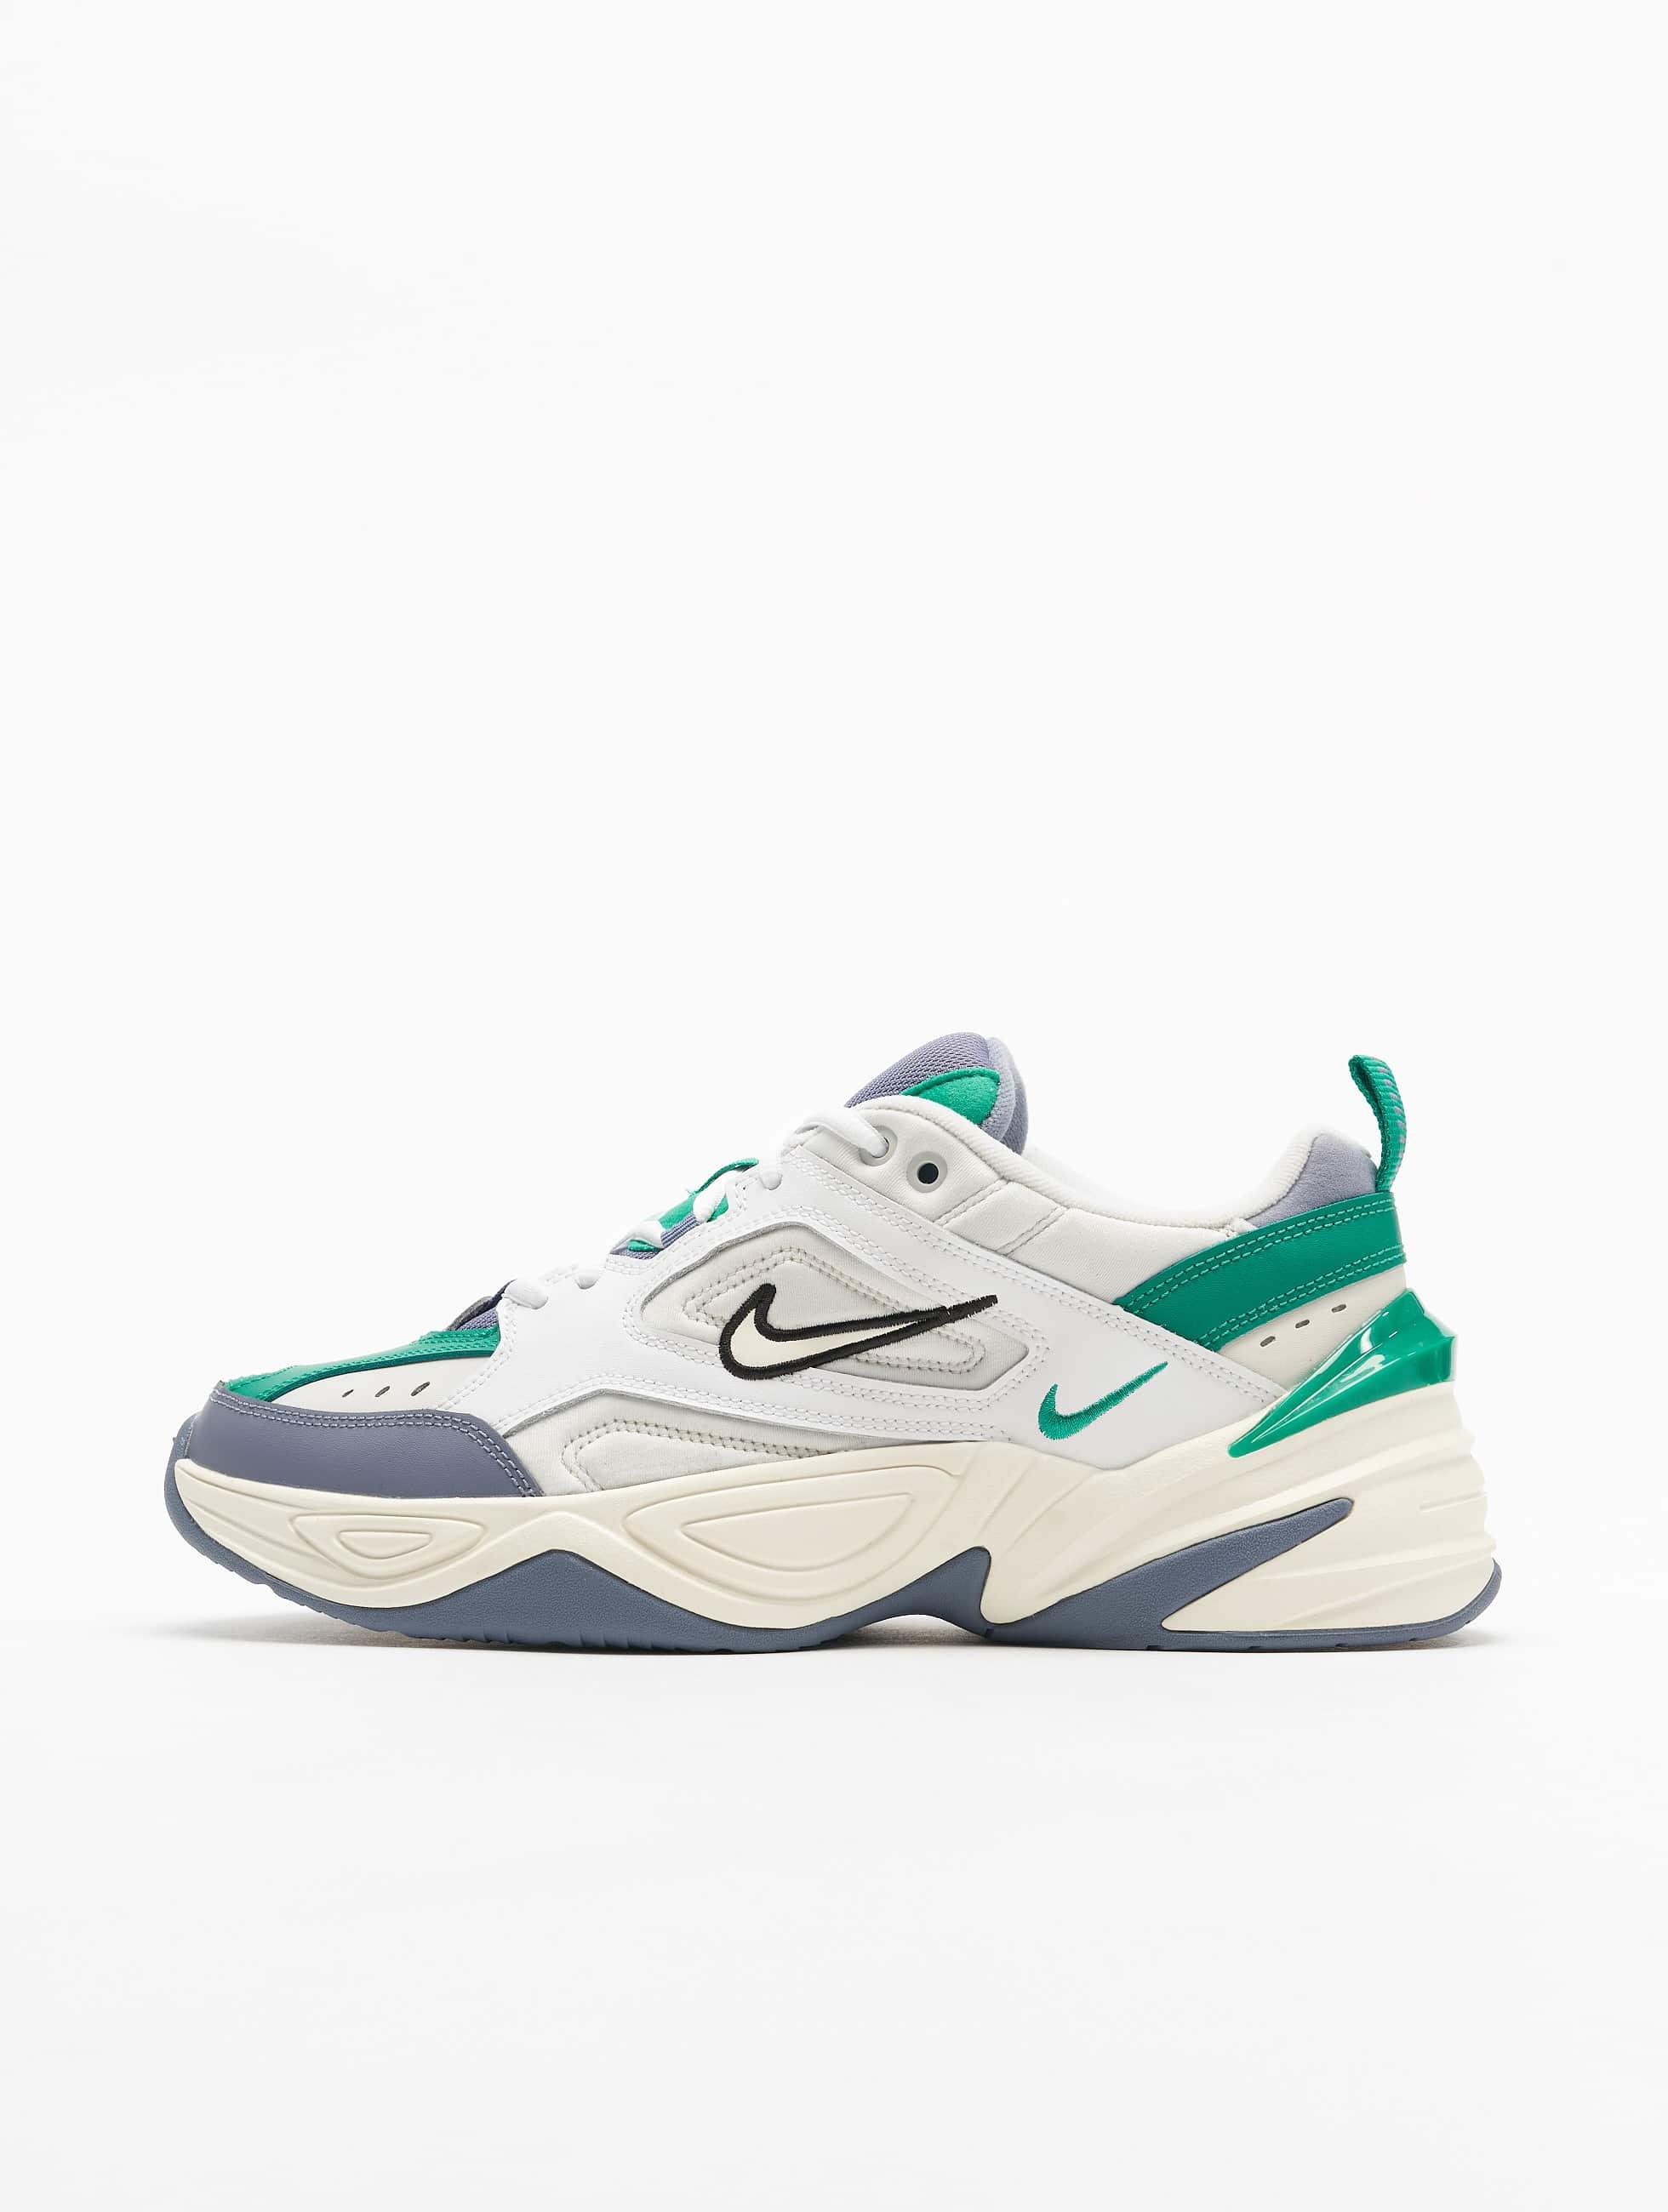 Nike M2K Tekno Sneakers Platinum Tint/Sail/Lucid Green